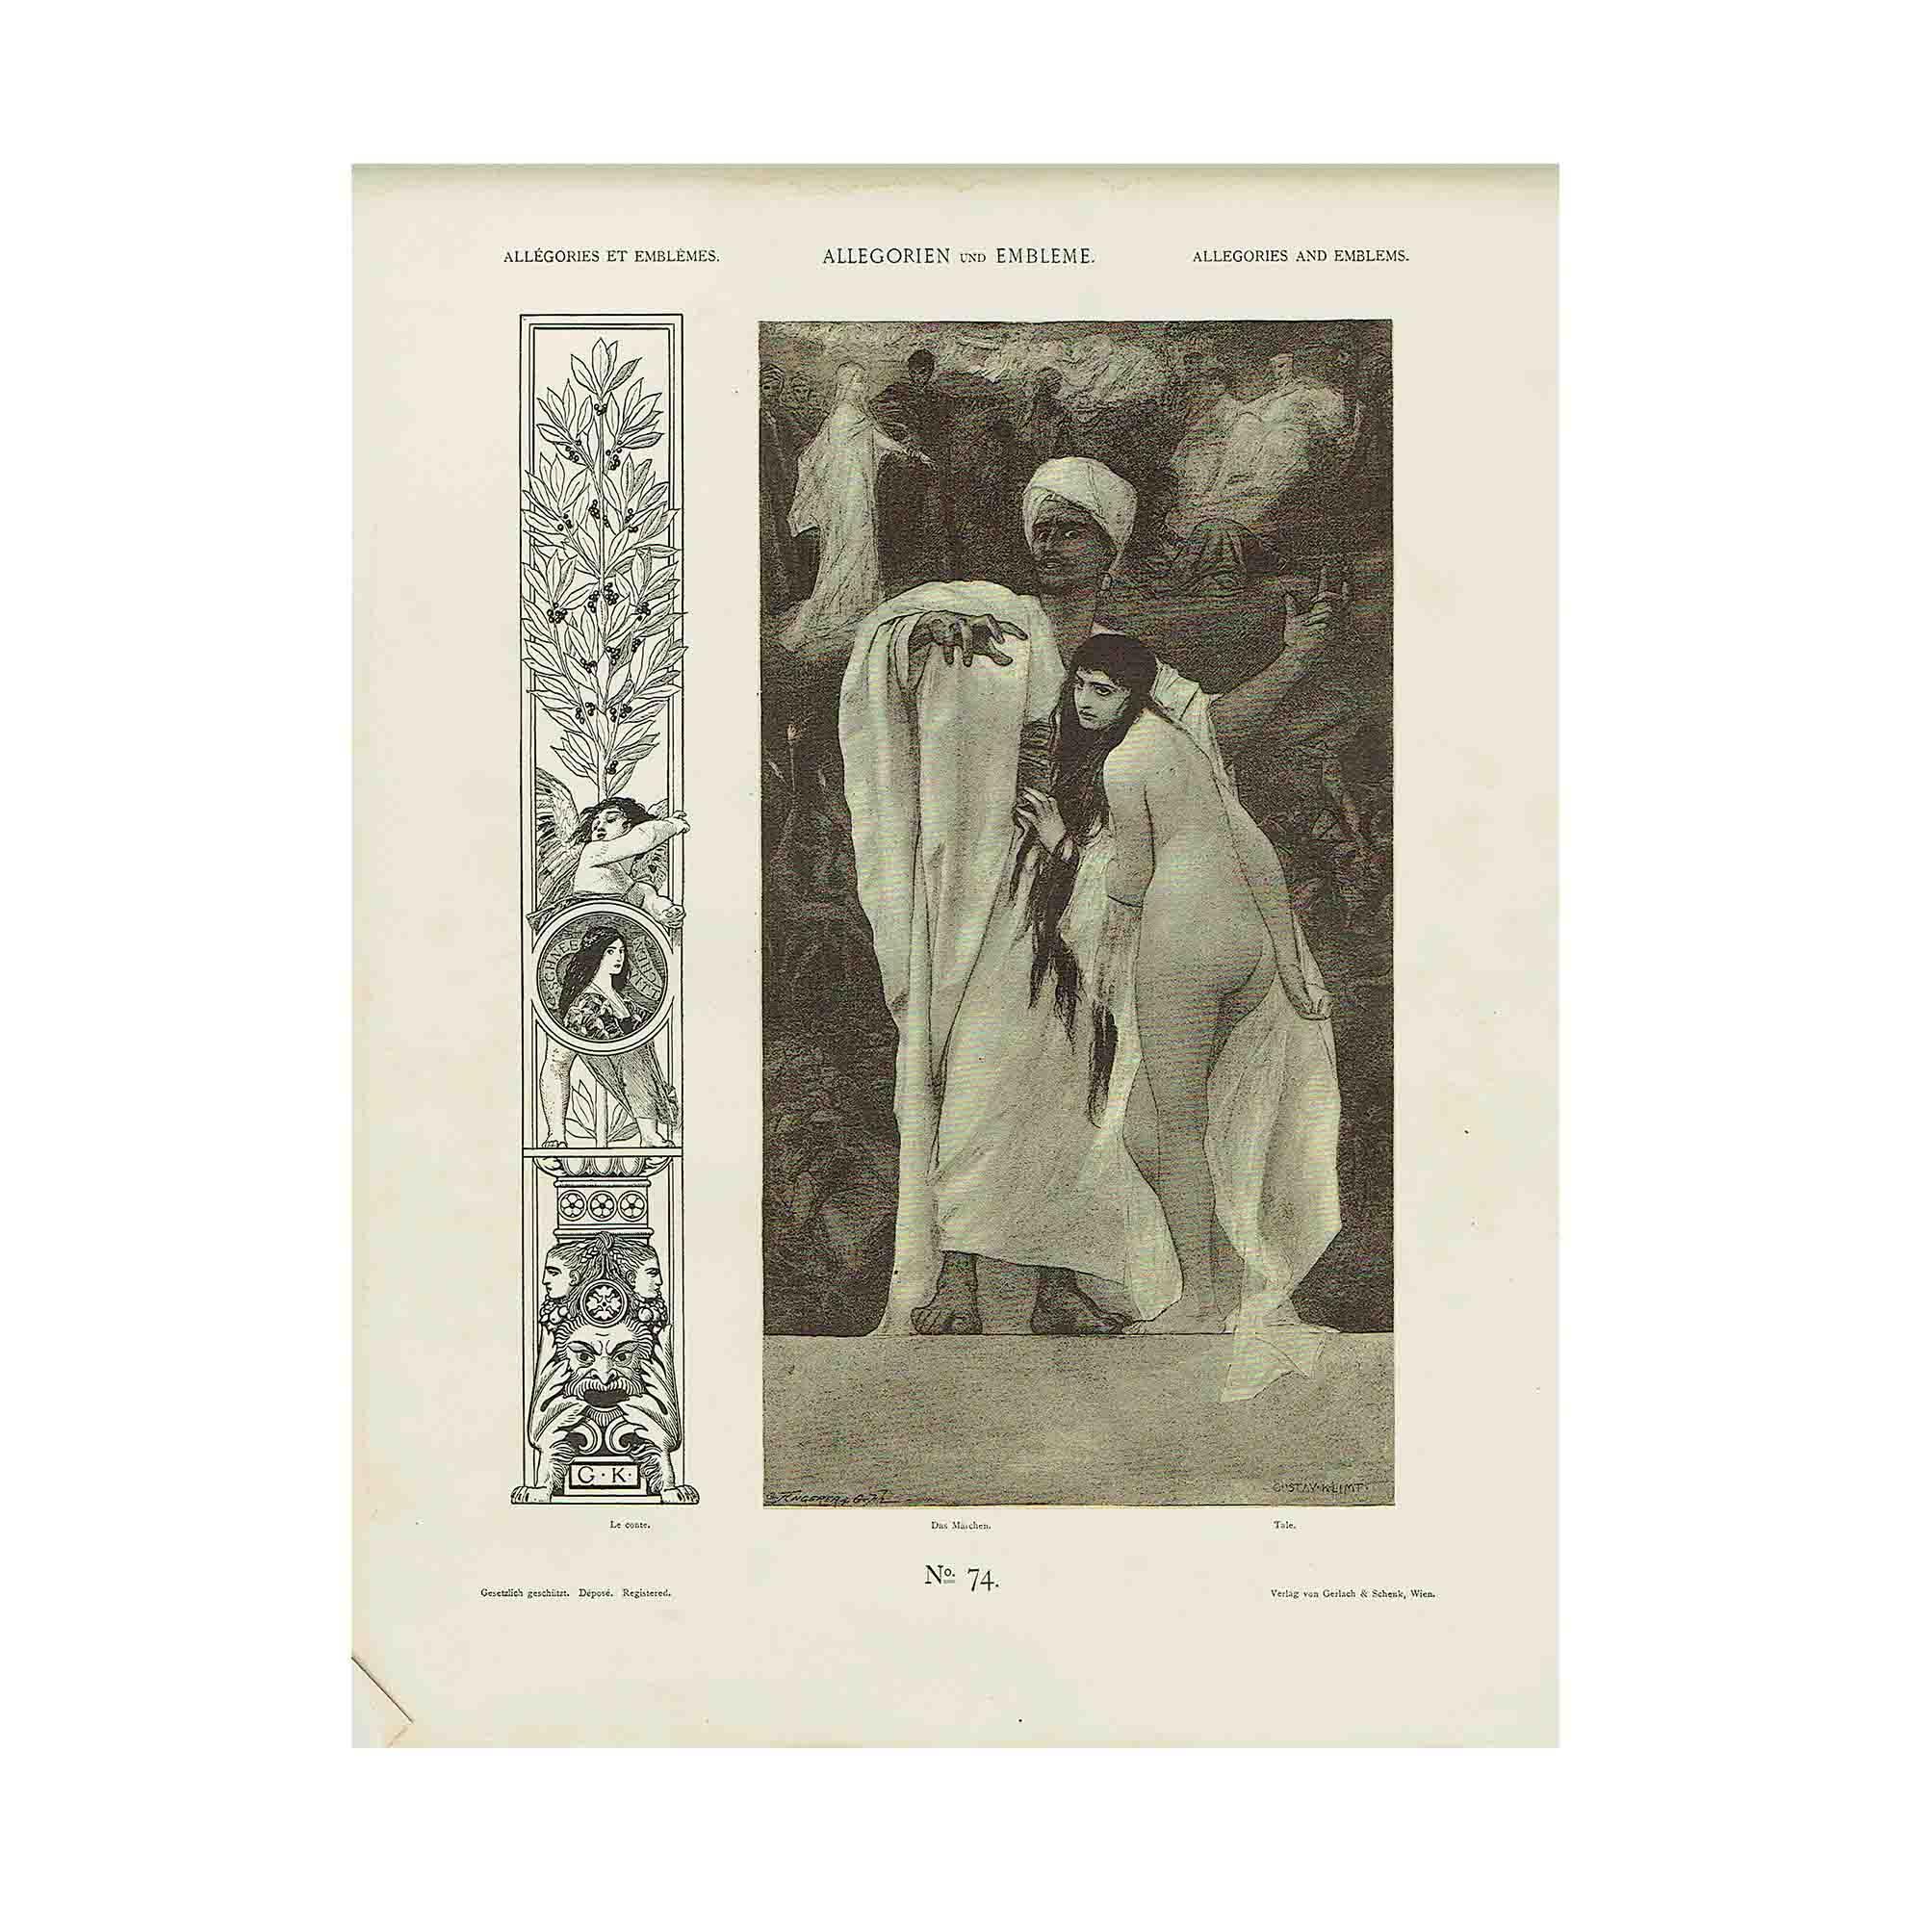 5576-Gerlach-Mappe-Allegorien-1882-Klimt-1-N.jpg